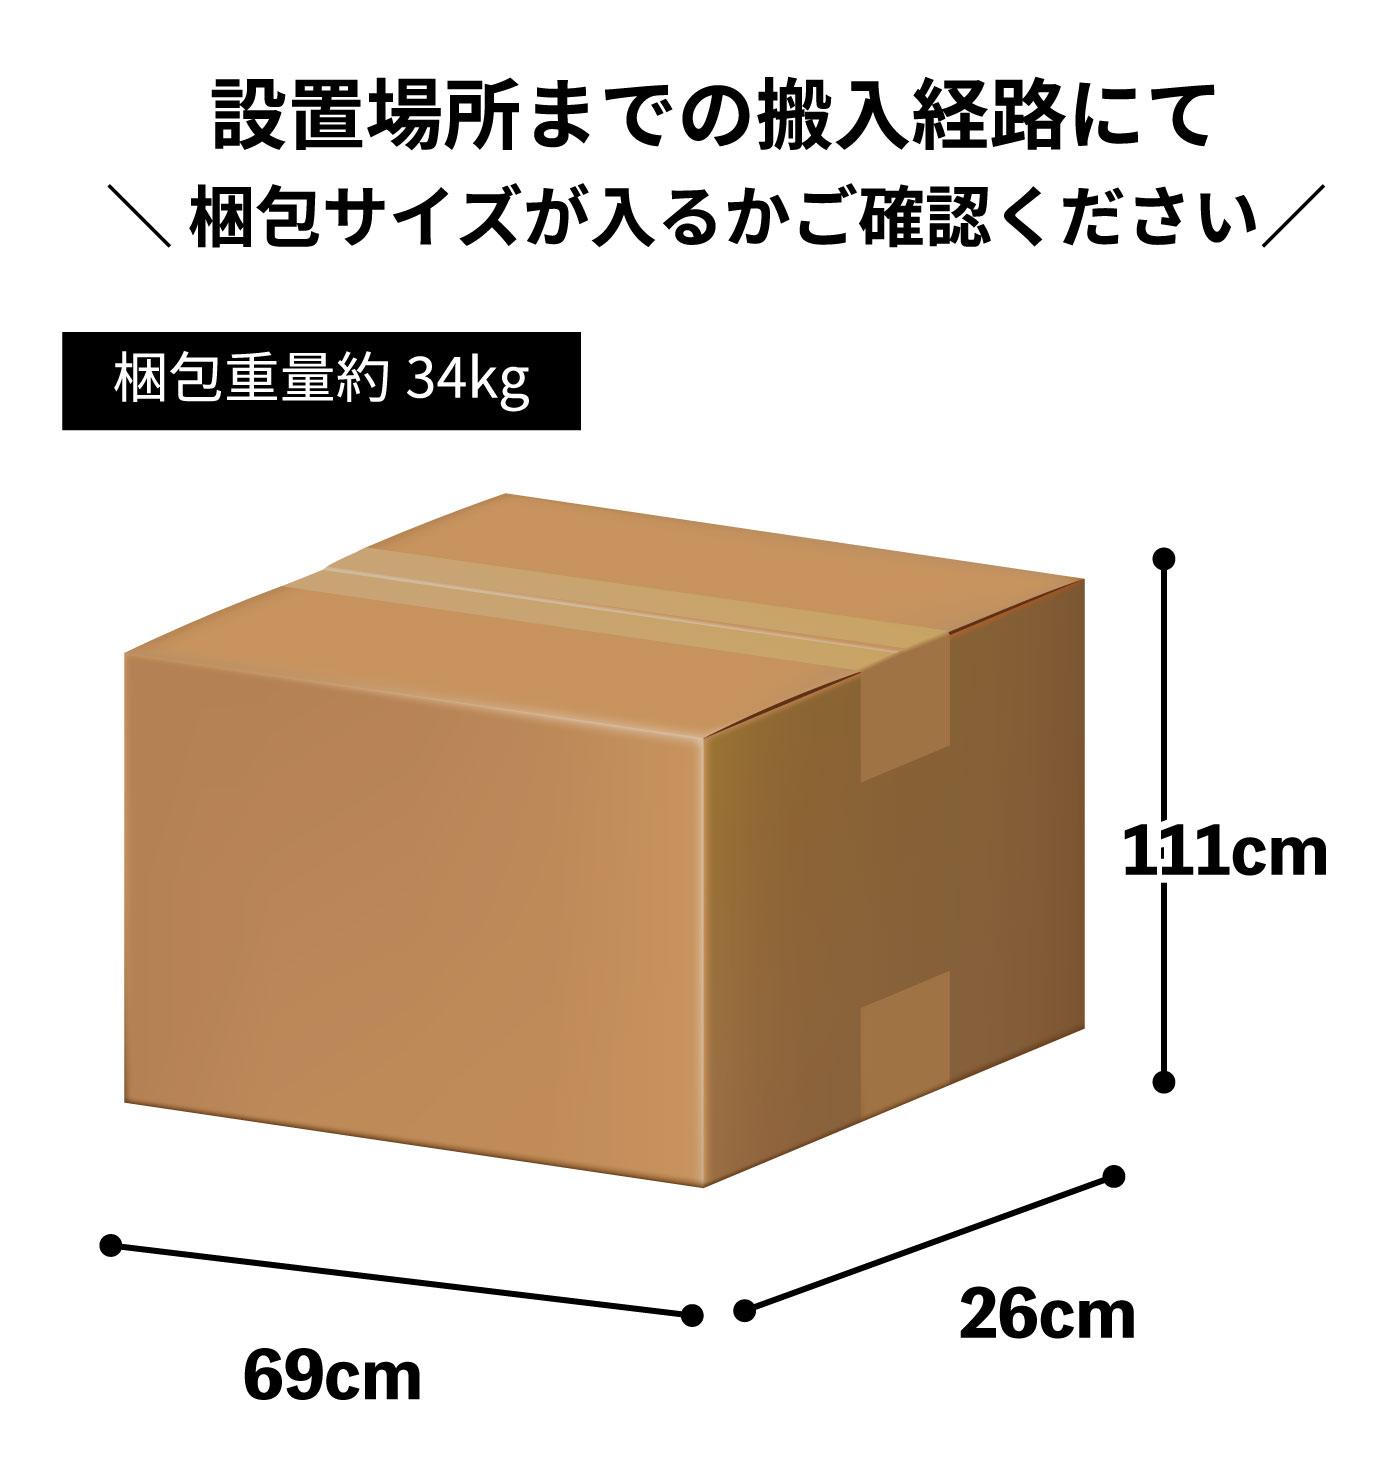 DK-8604Rの梱包サイズ